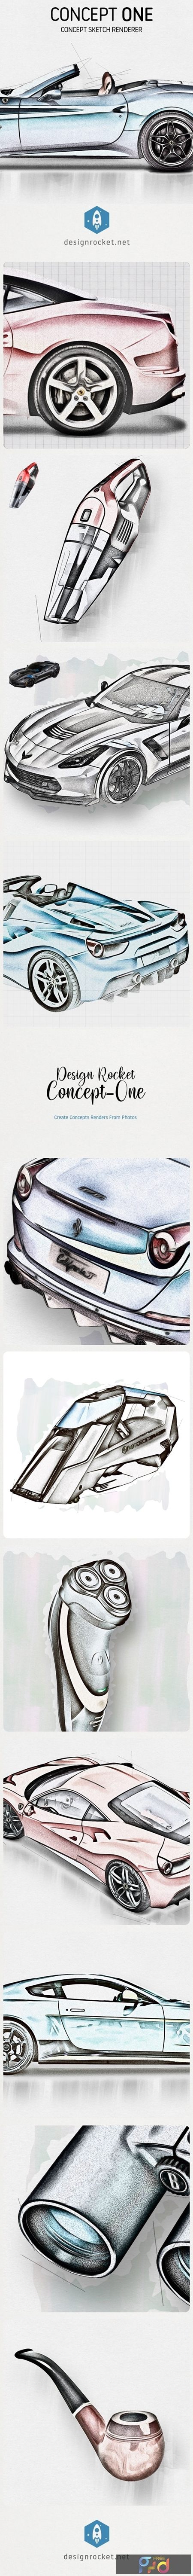 Concept One - Concept Sketch Renderer Action 25268416 1